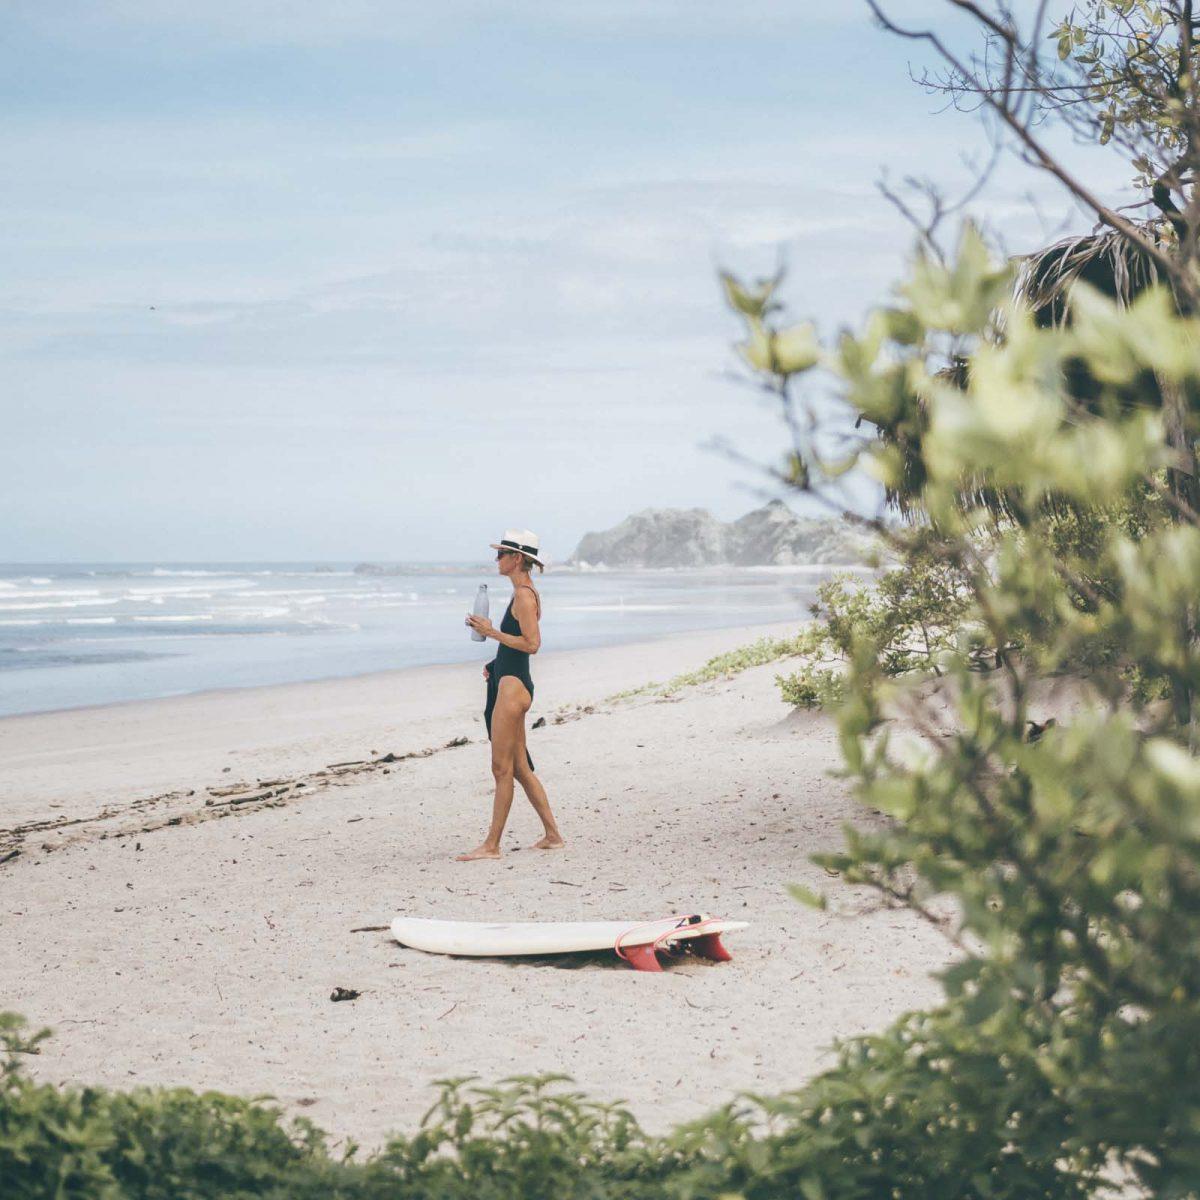 Surf Lifestyle beach Nosara Costa Rica